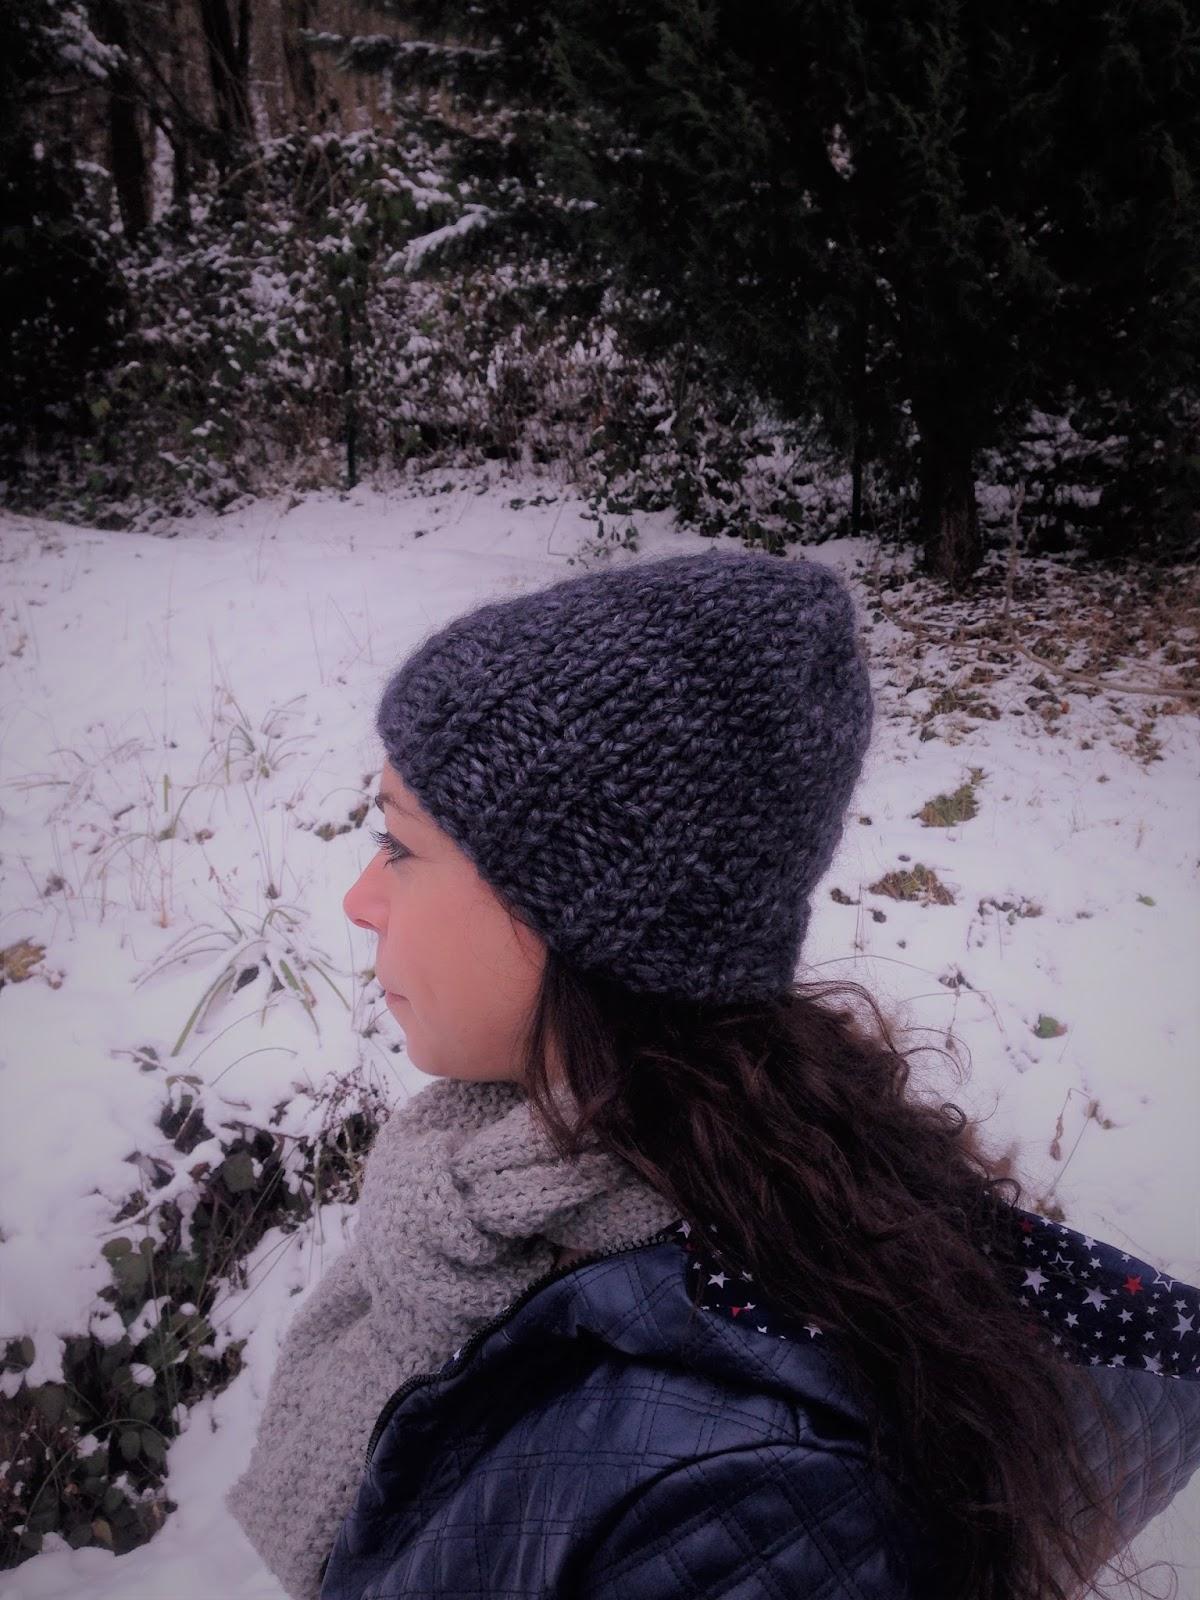 ... http   www.rosechiffon.fr 2015 09 16 tuto-tricoter-un-bonnet-aiguilles- n10 http   www.rosechiffon.fr 2015 09 16 tuto-tricoter-un-bonnet-aiguilles- n10  018cca708fb